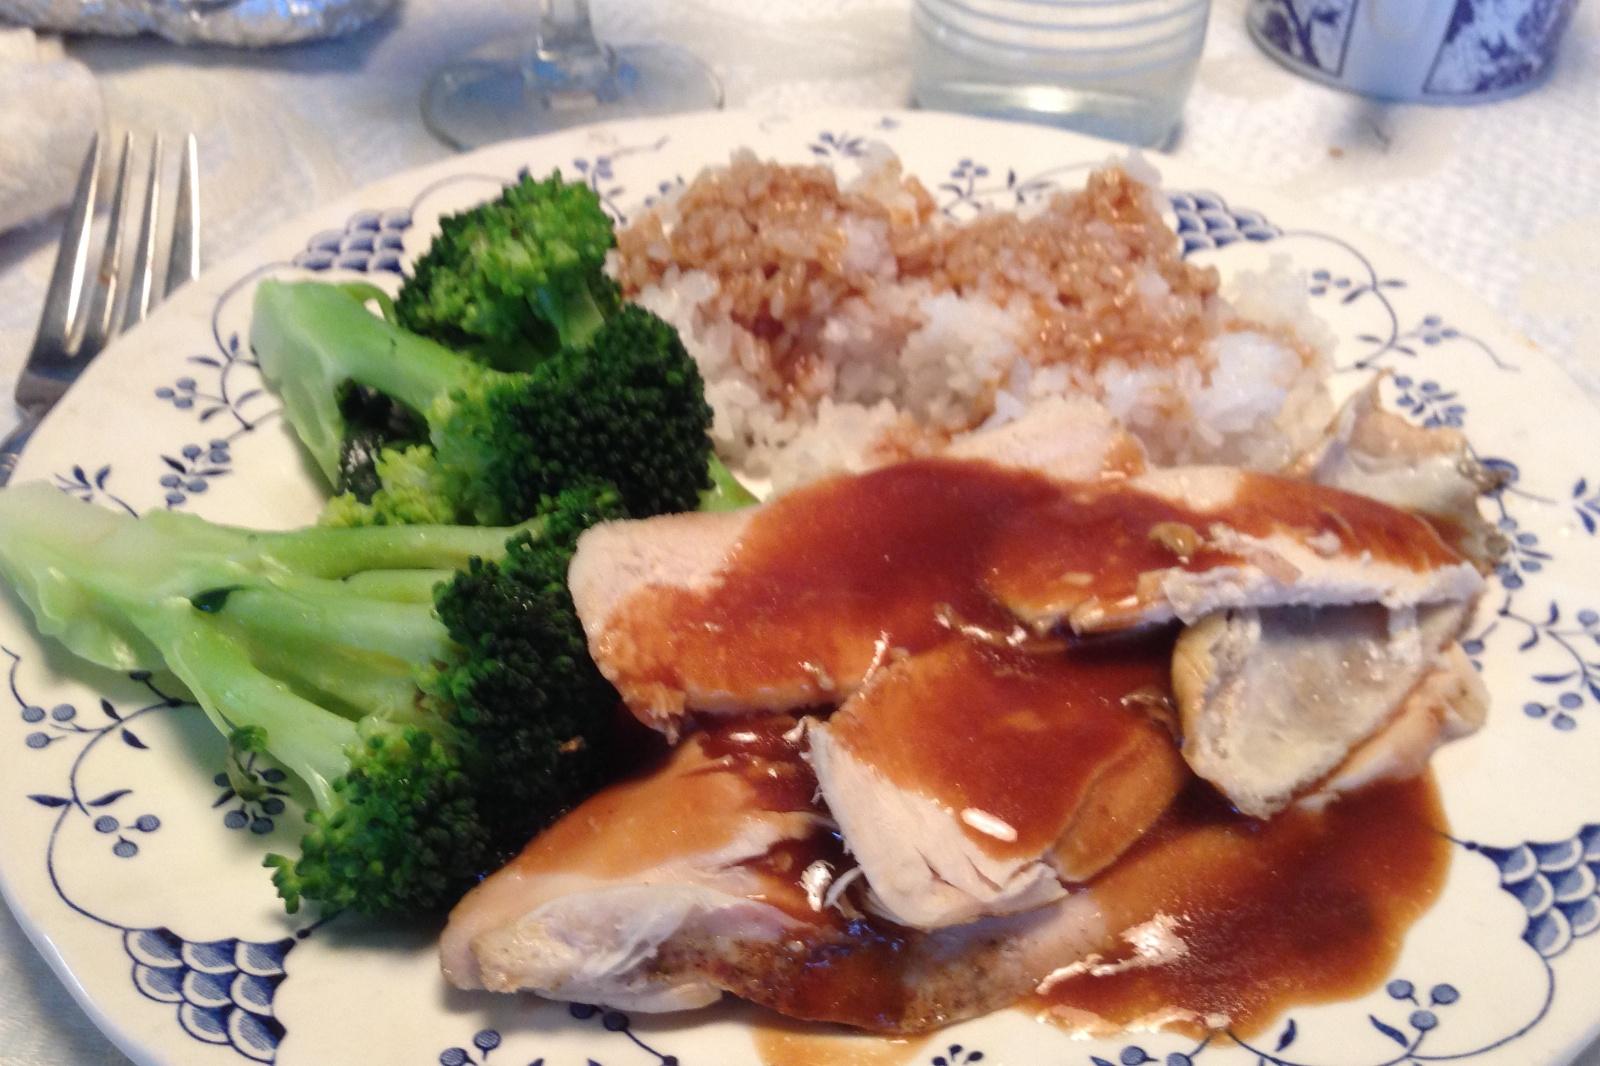 http://blog.rickk.com/food/2014/08/25/ate.2014.08.25.d.jpg